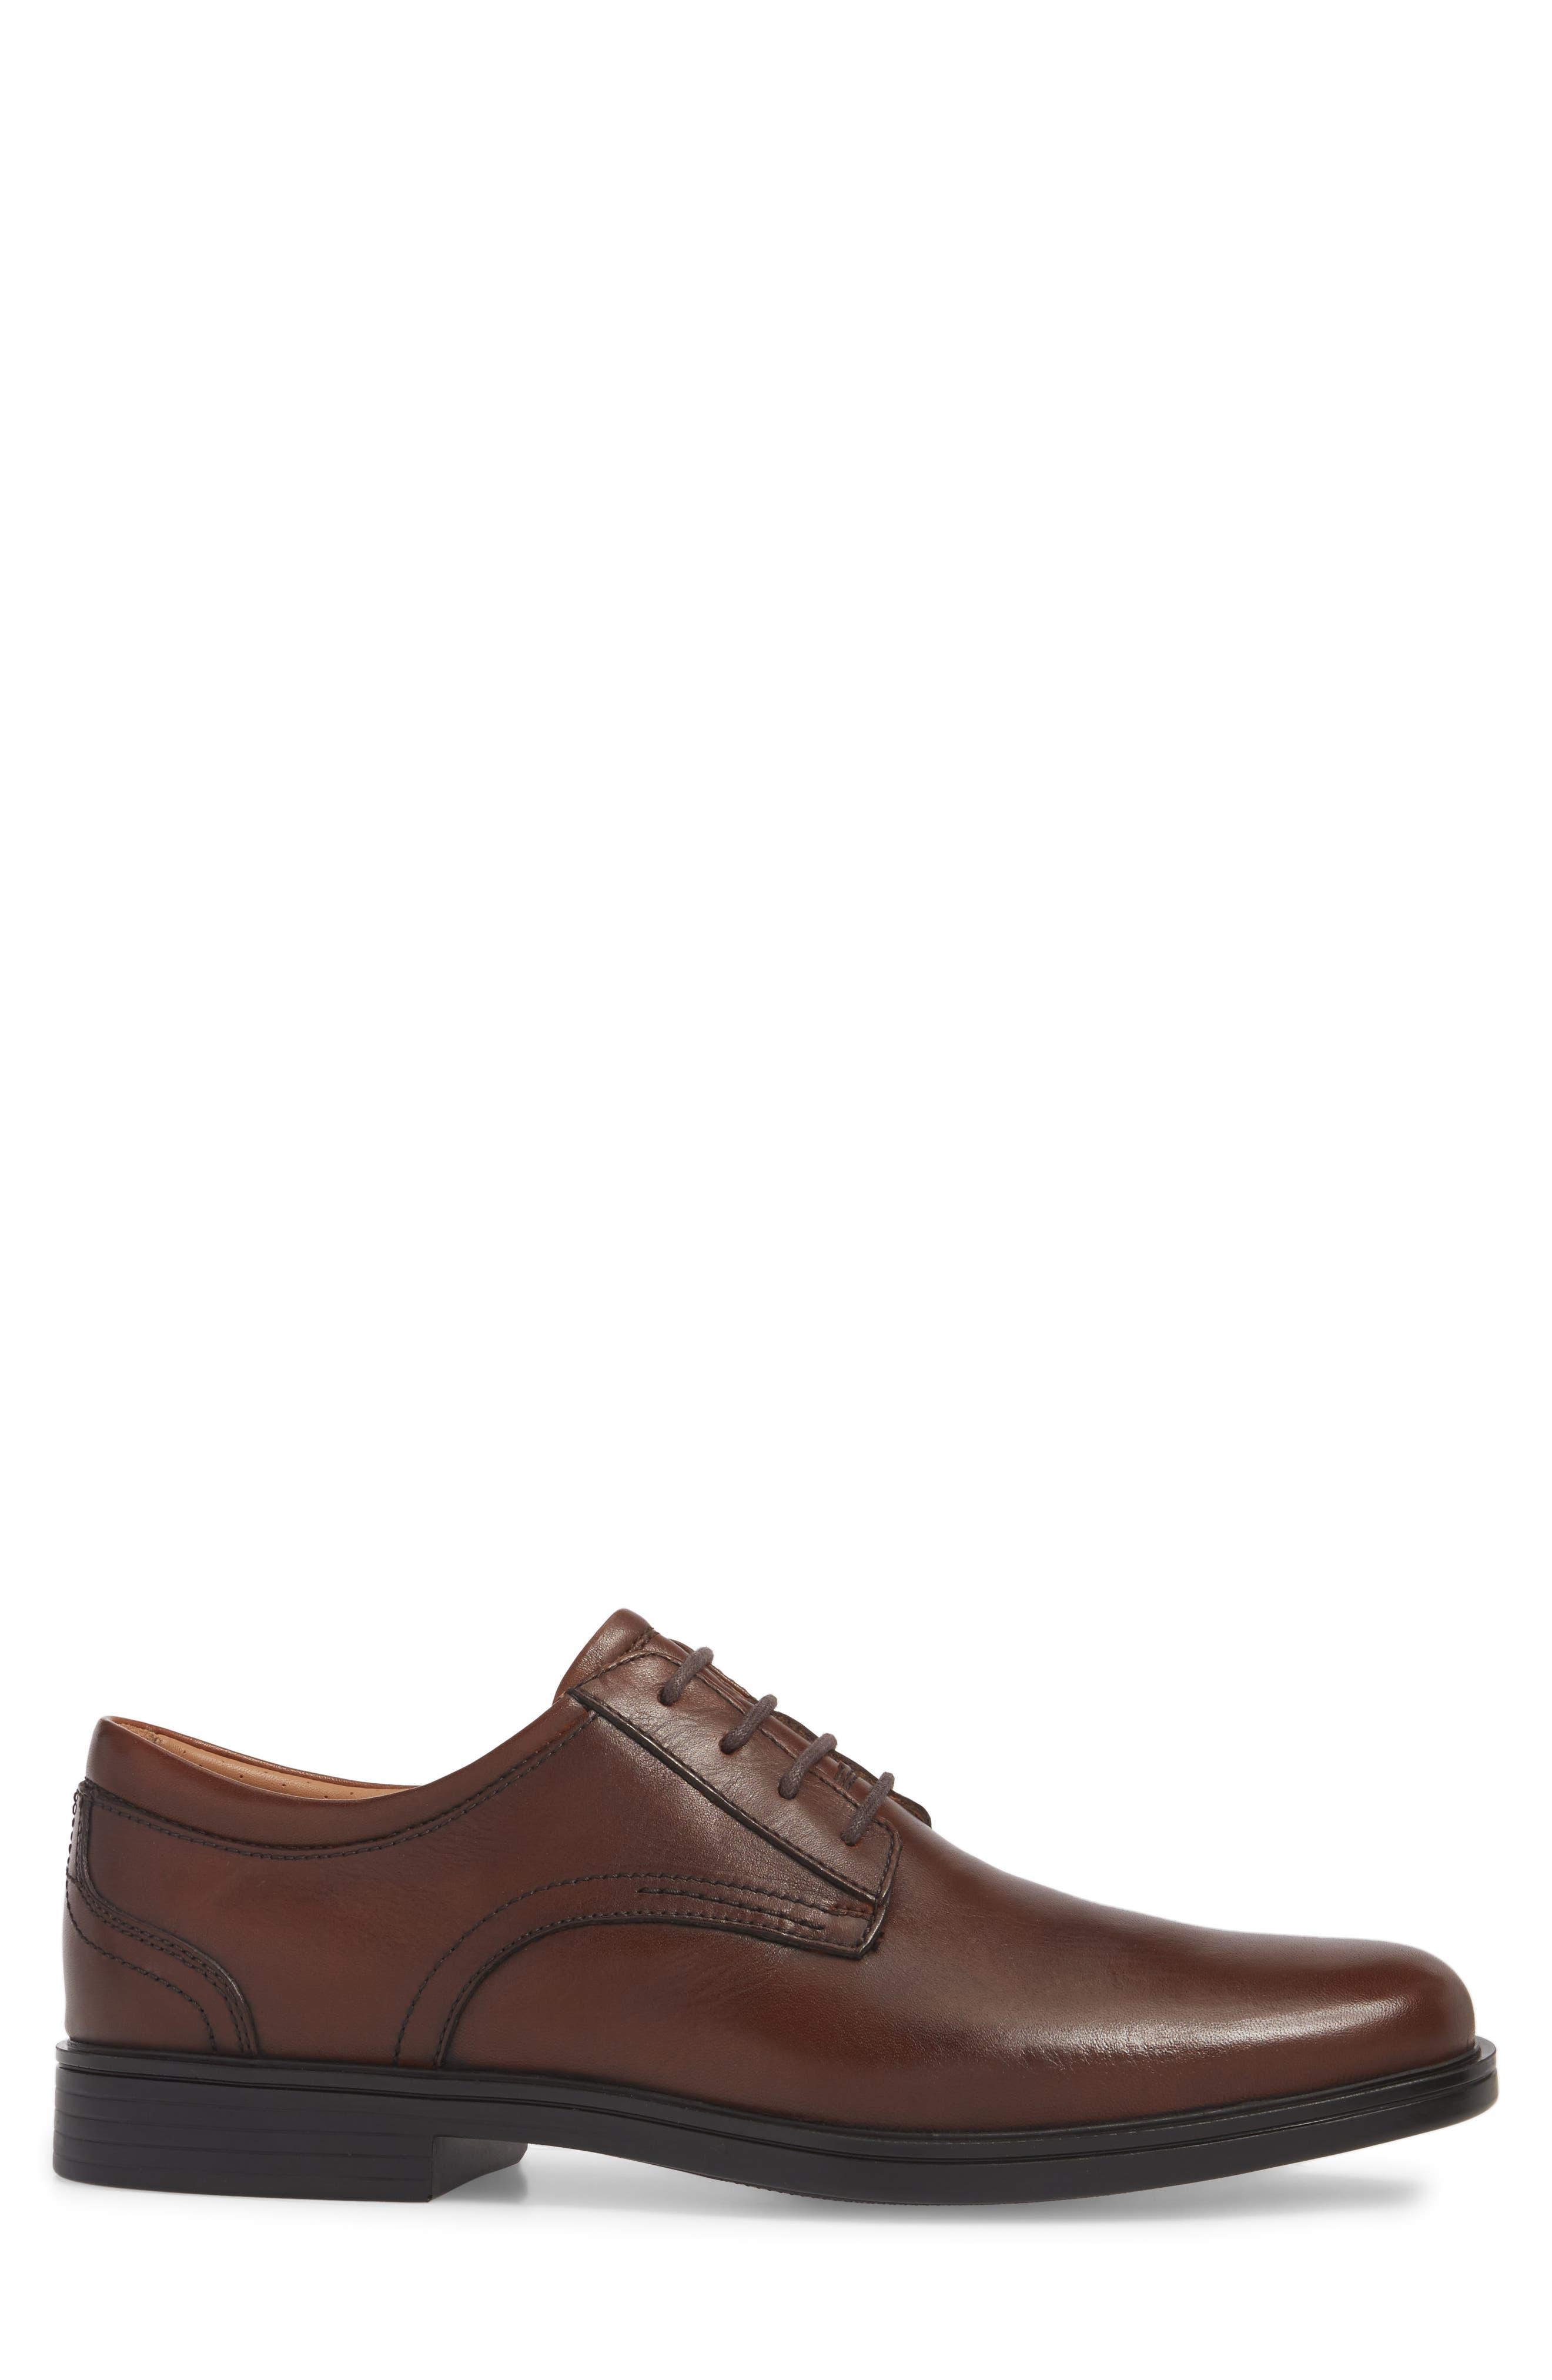 Unaldric Plain Toe Derby,                             Alternate thumbnail 3, color,                             Dark Tan Leather